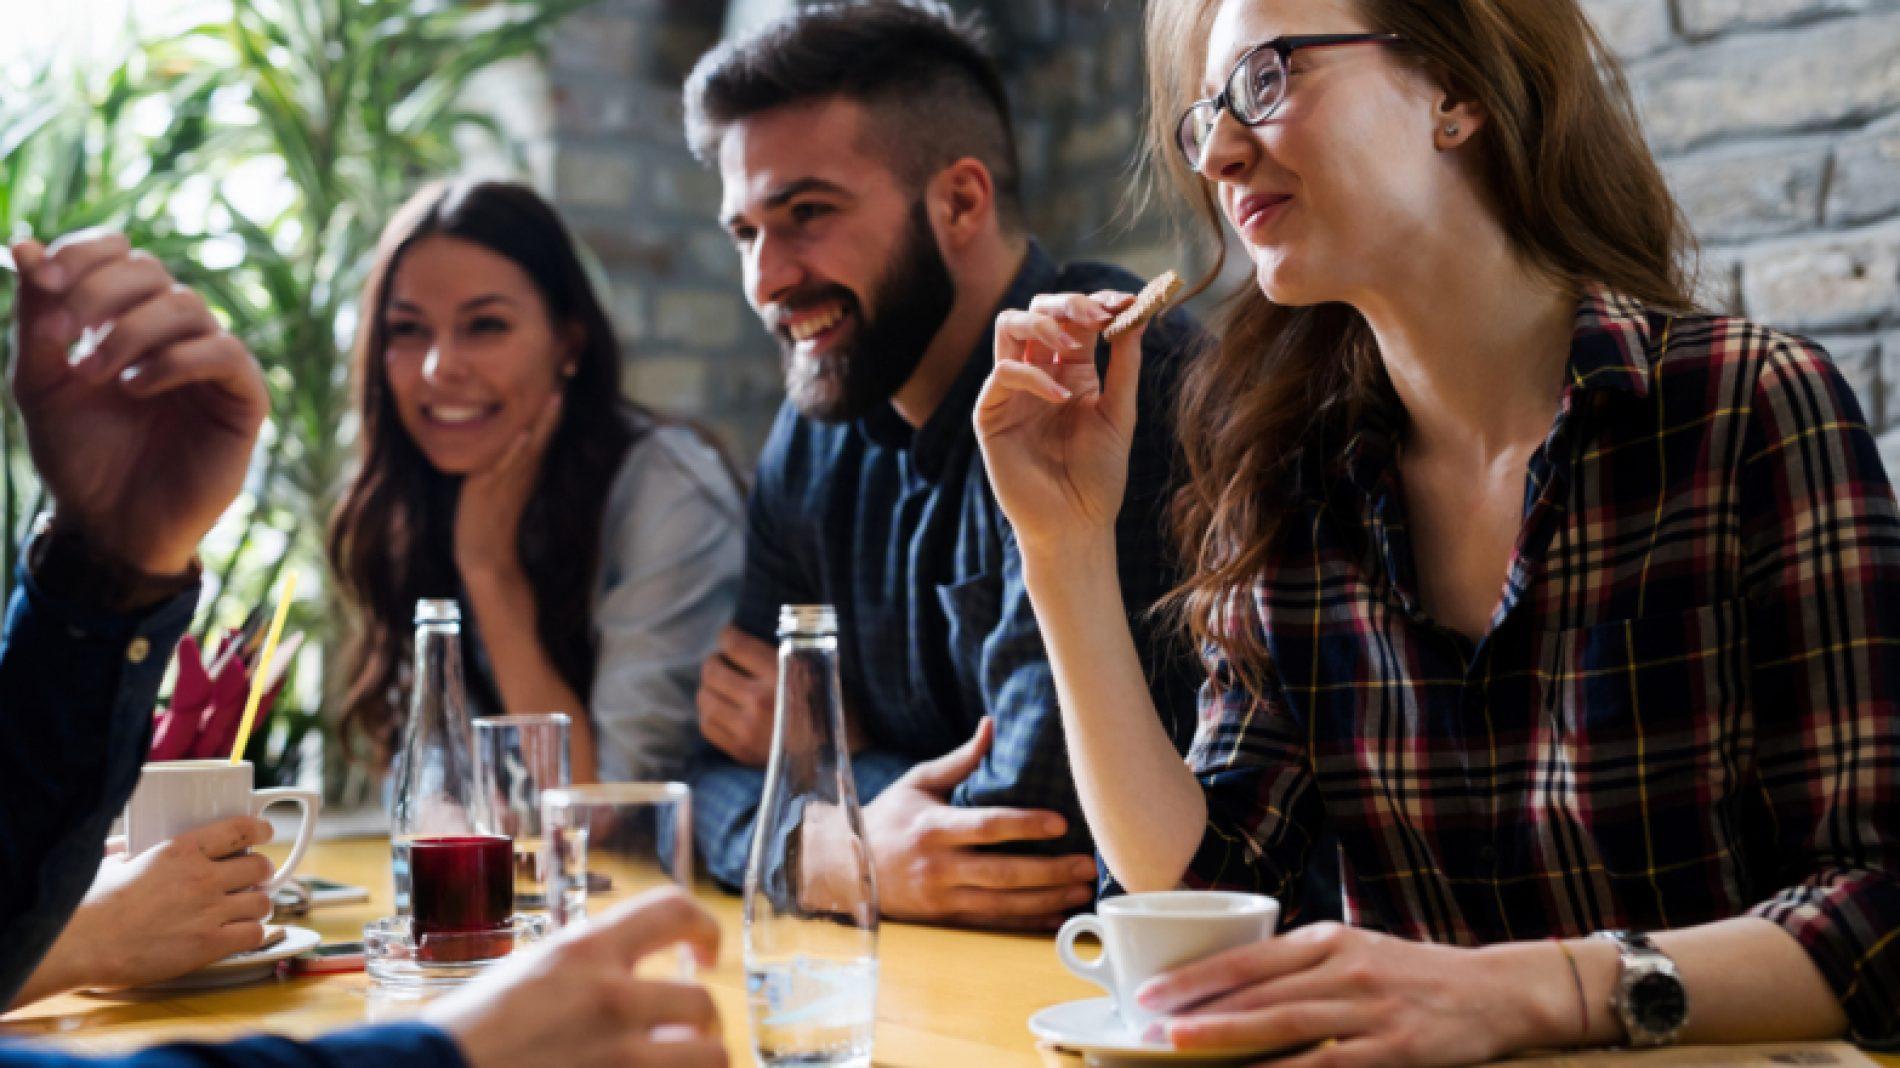 group-in-coffee-shop-akdxOr